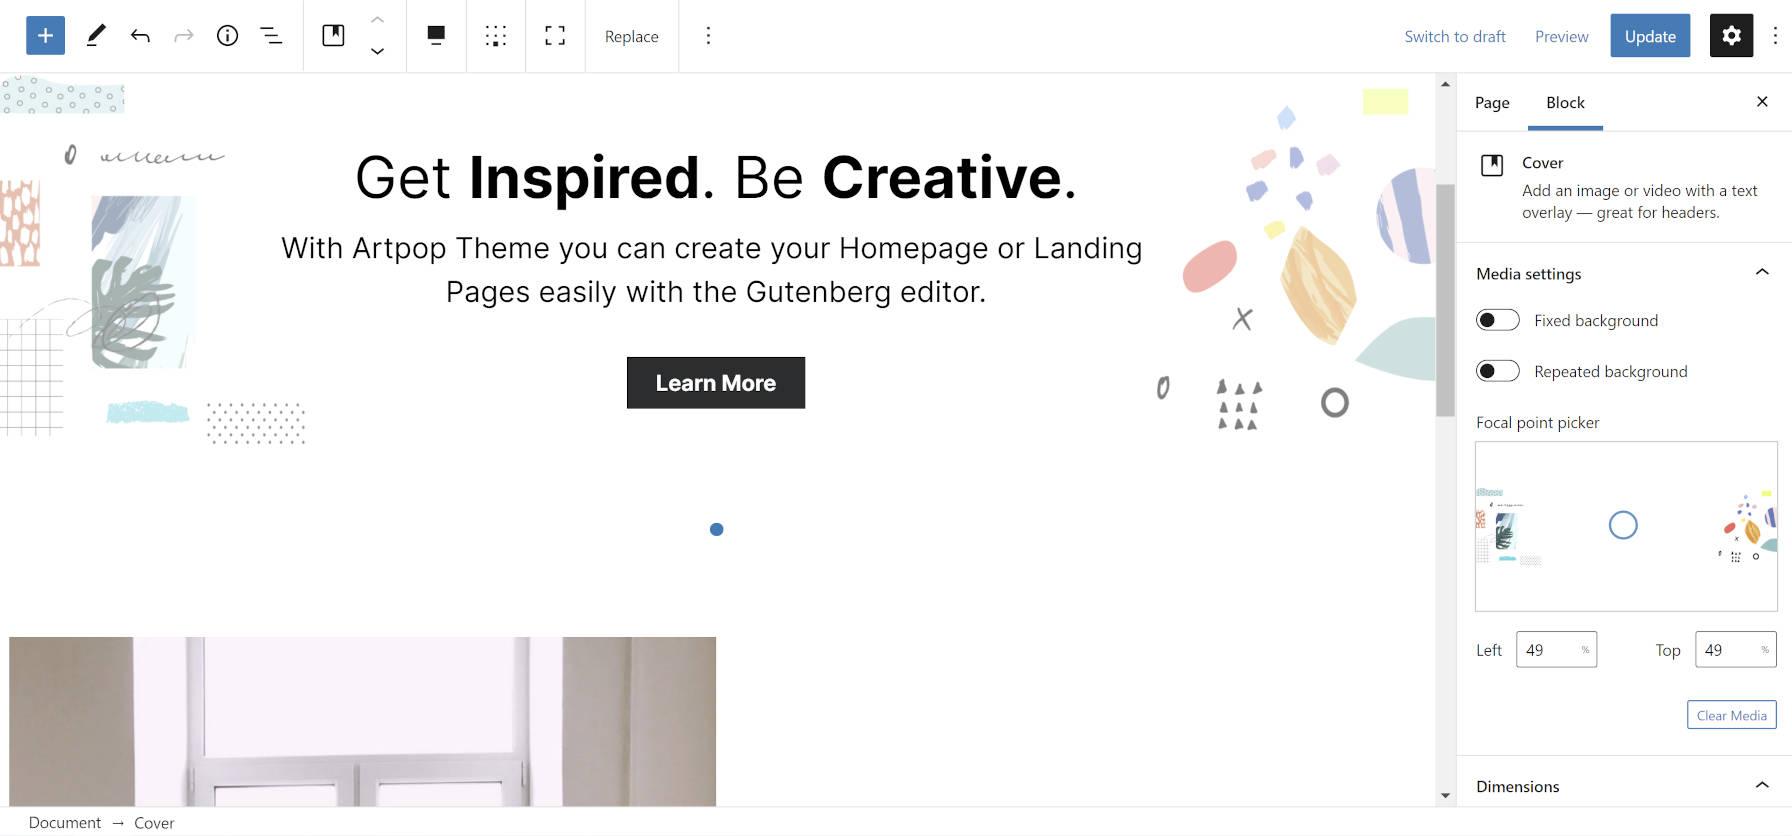 design-lab-releases-artpop-a-block-ready-wordpress-theme-1设计实验室发布Artpop,这是一个Block-ready WordPress主题